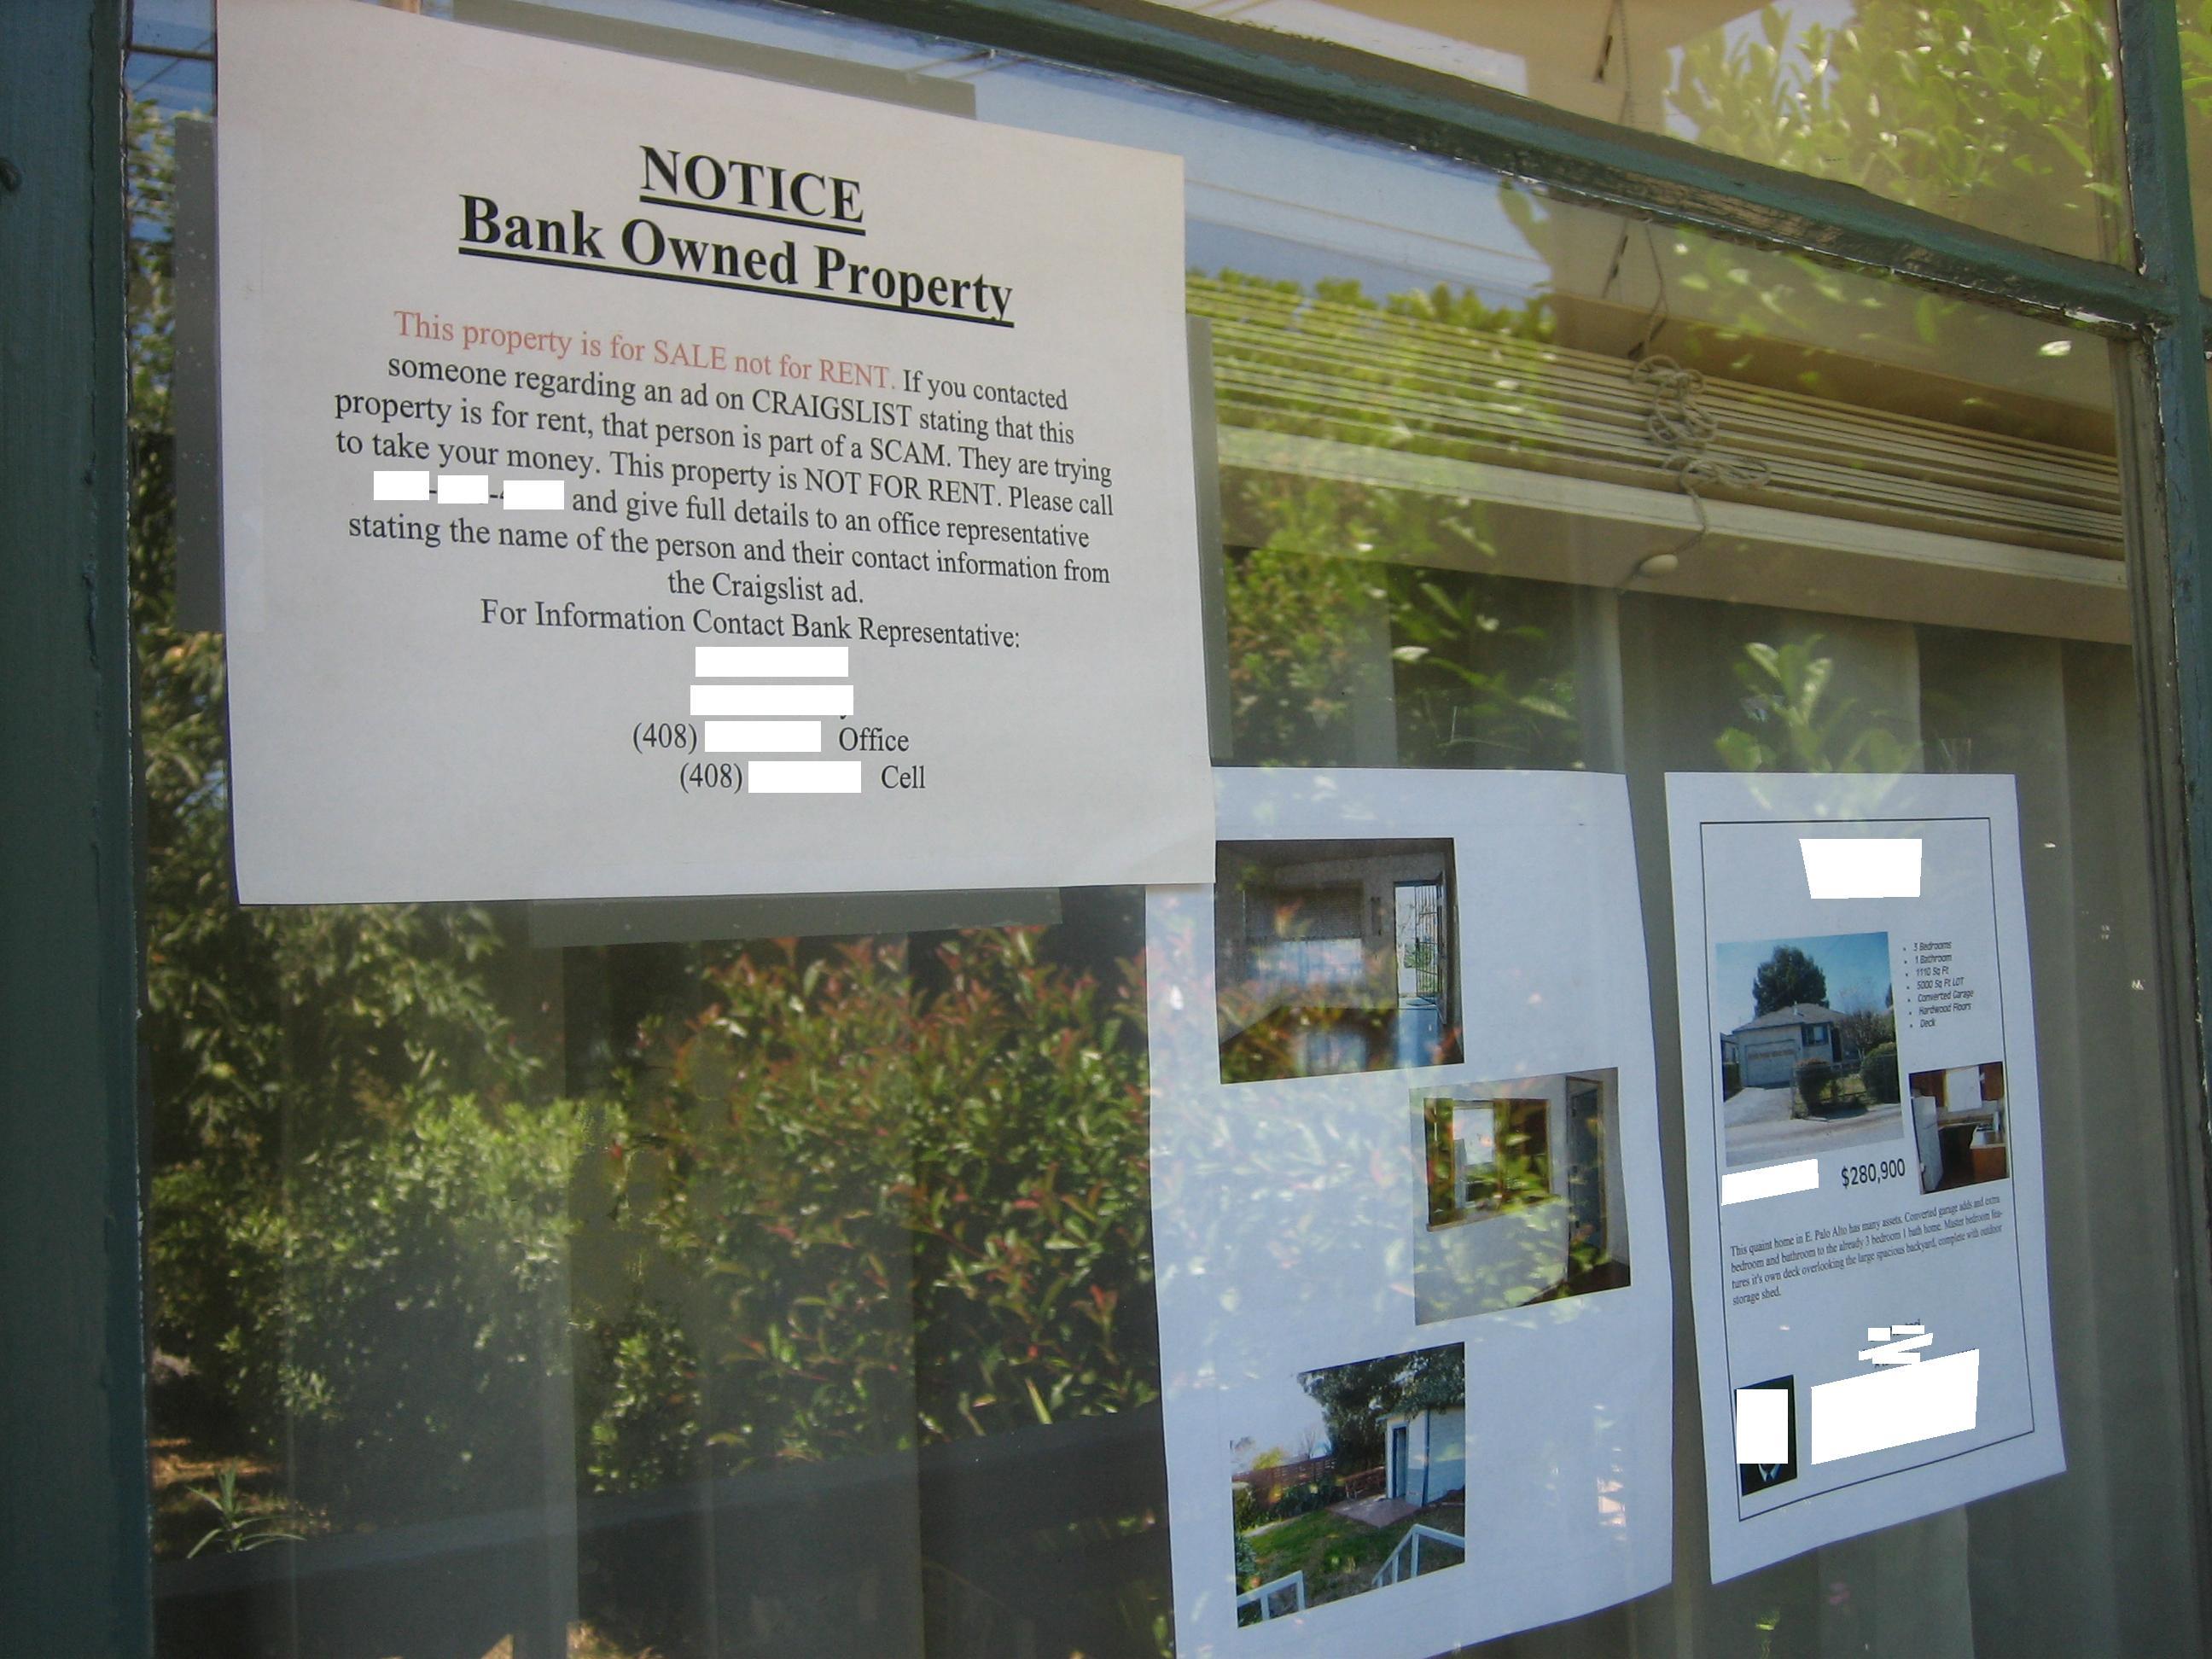 Foreclosure rental scam warning!